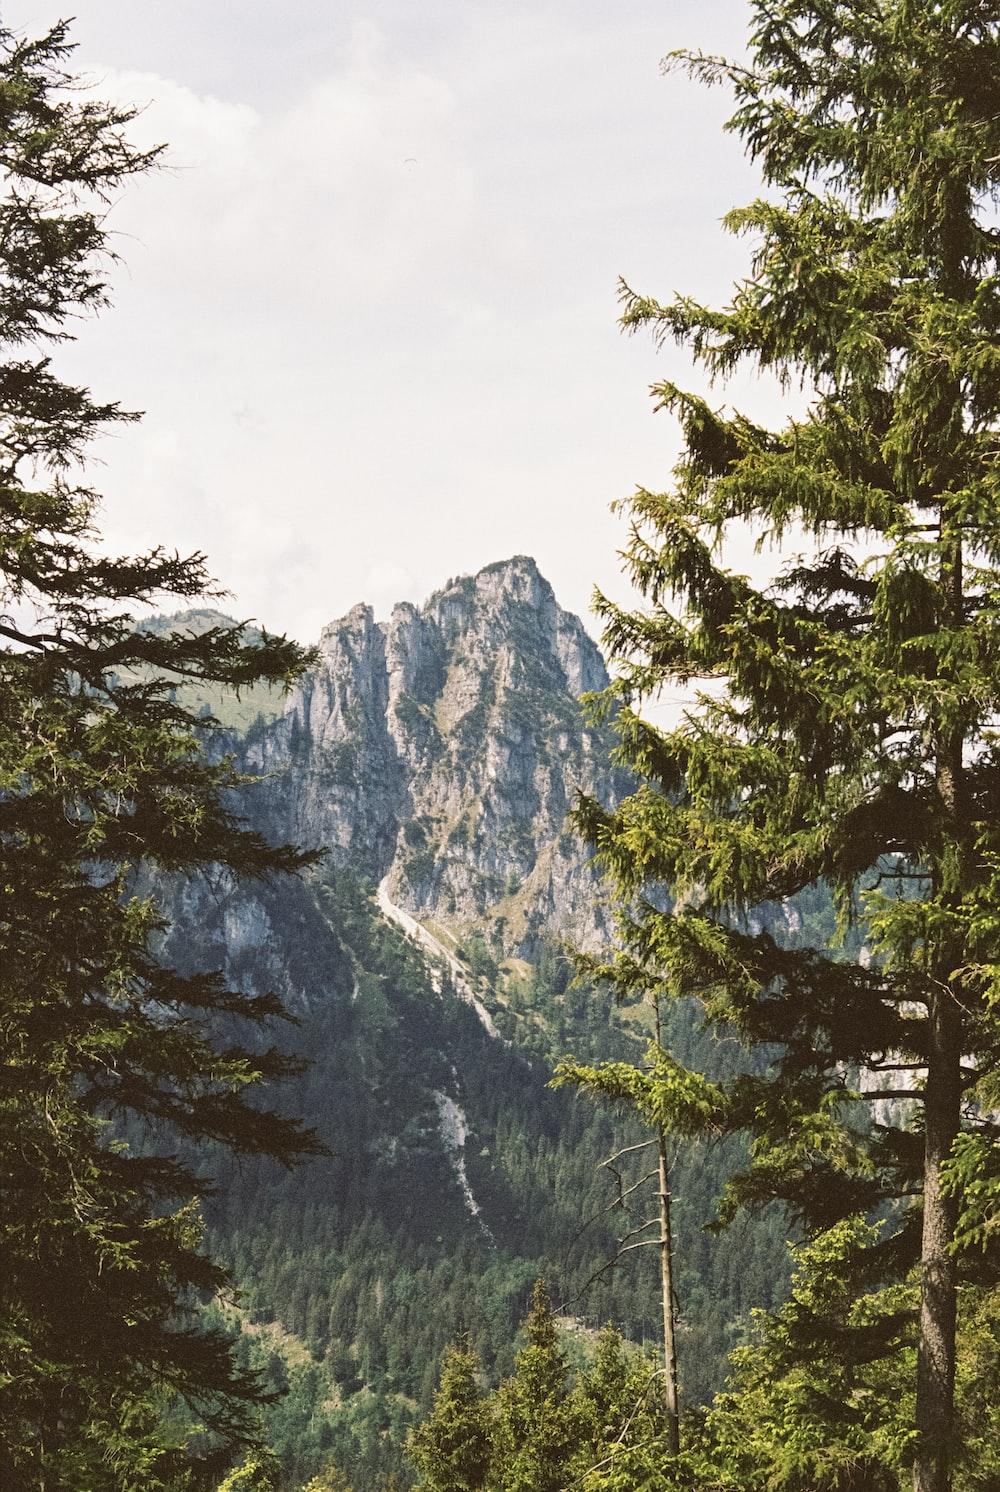 mountain with trees photo